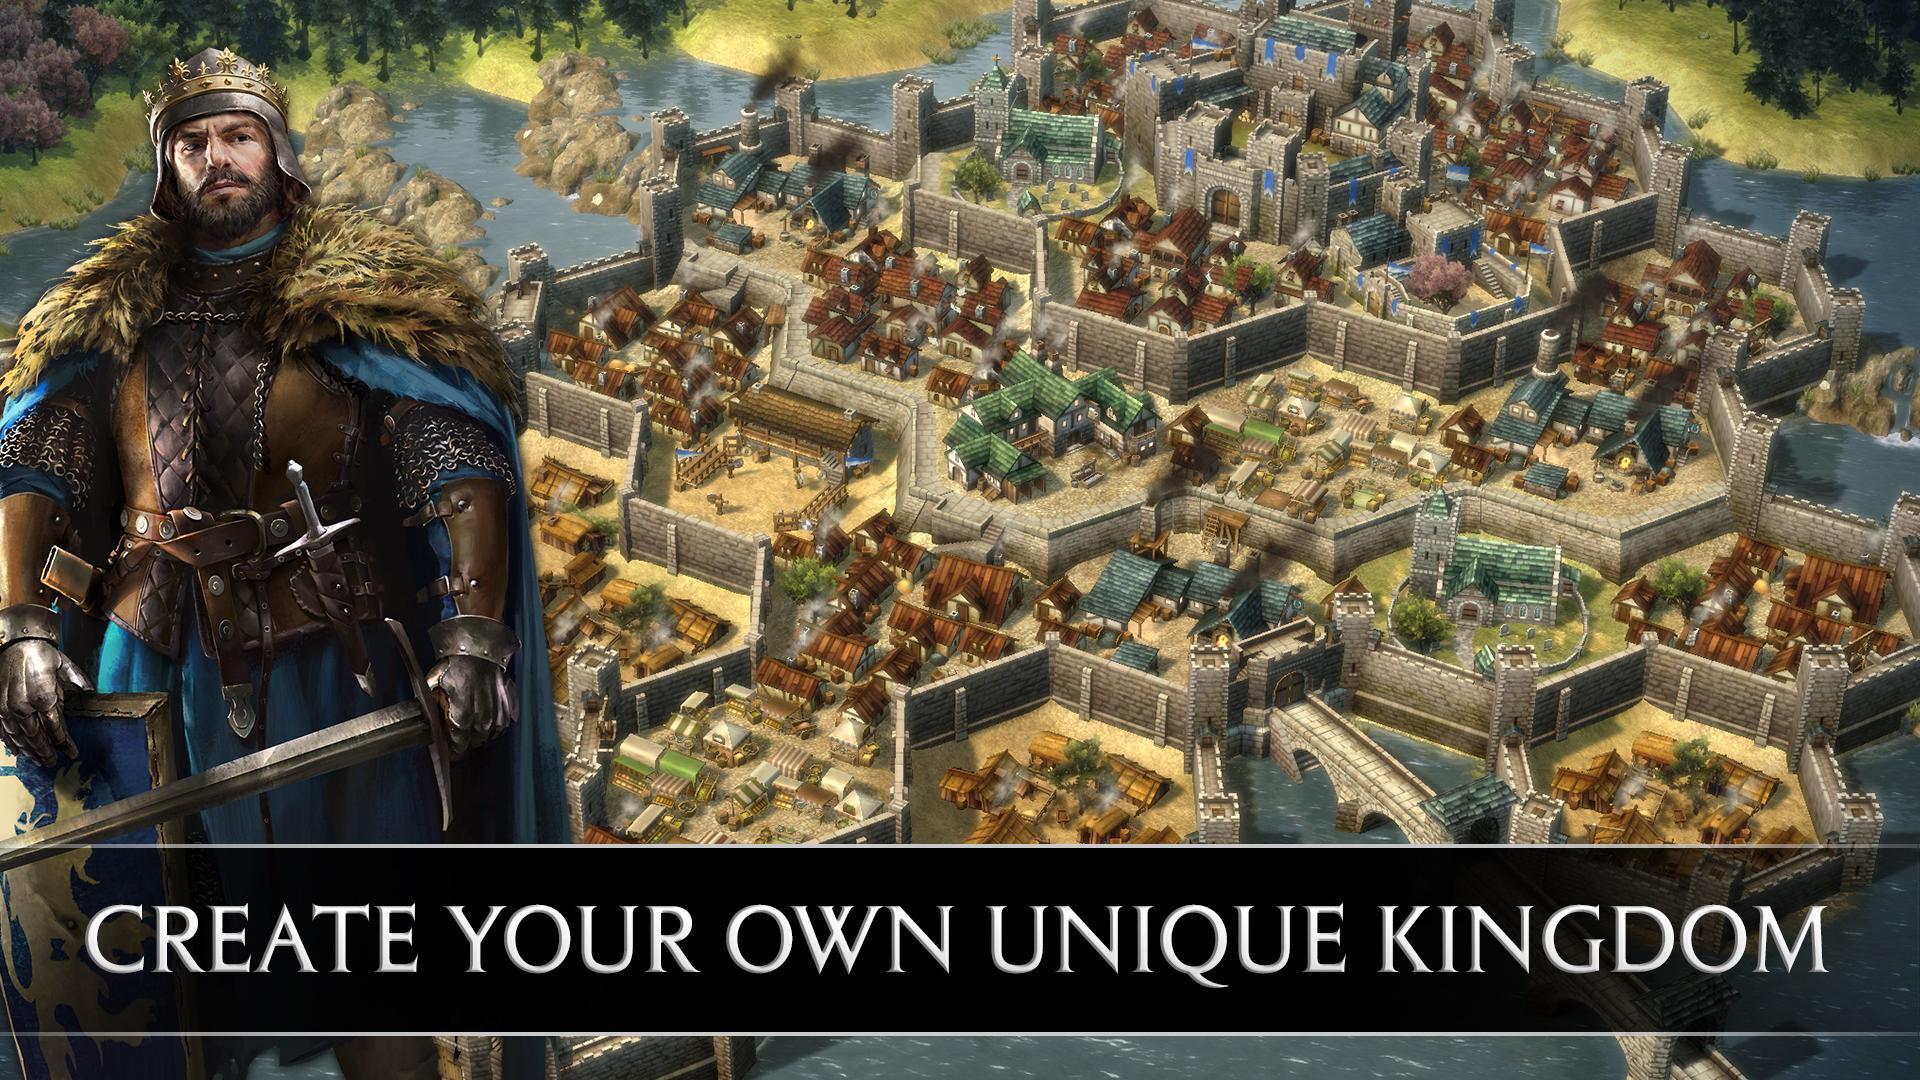 Total War Battles: KINGDOM - Strategy RPG 1.30 Screenshot 12